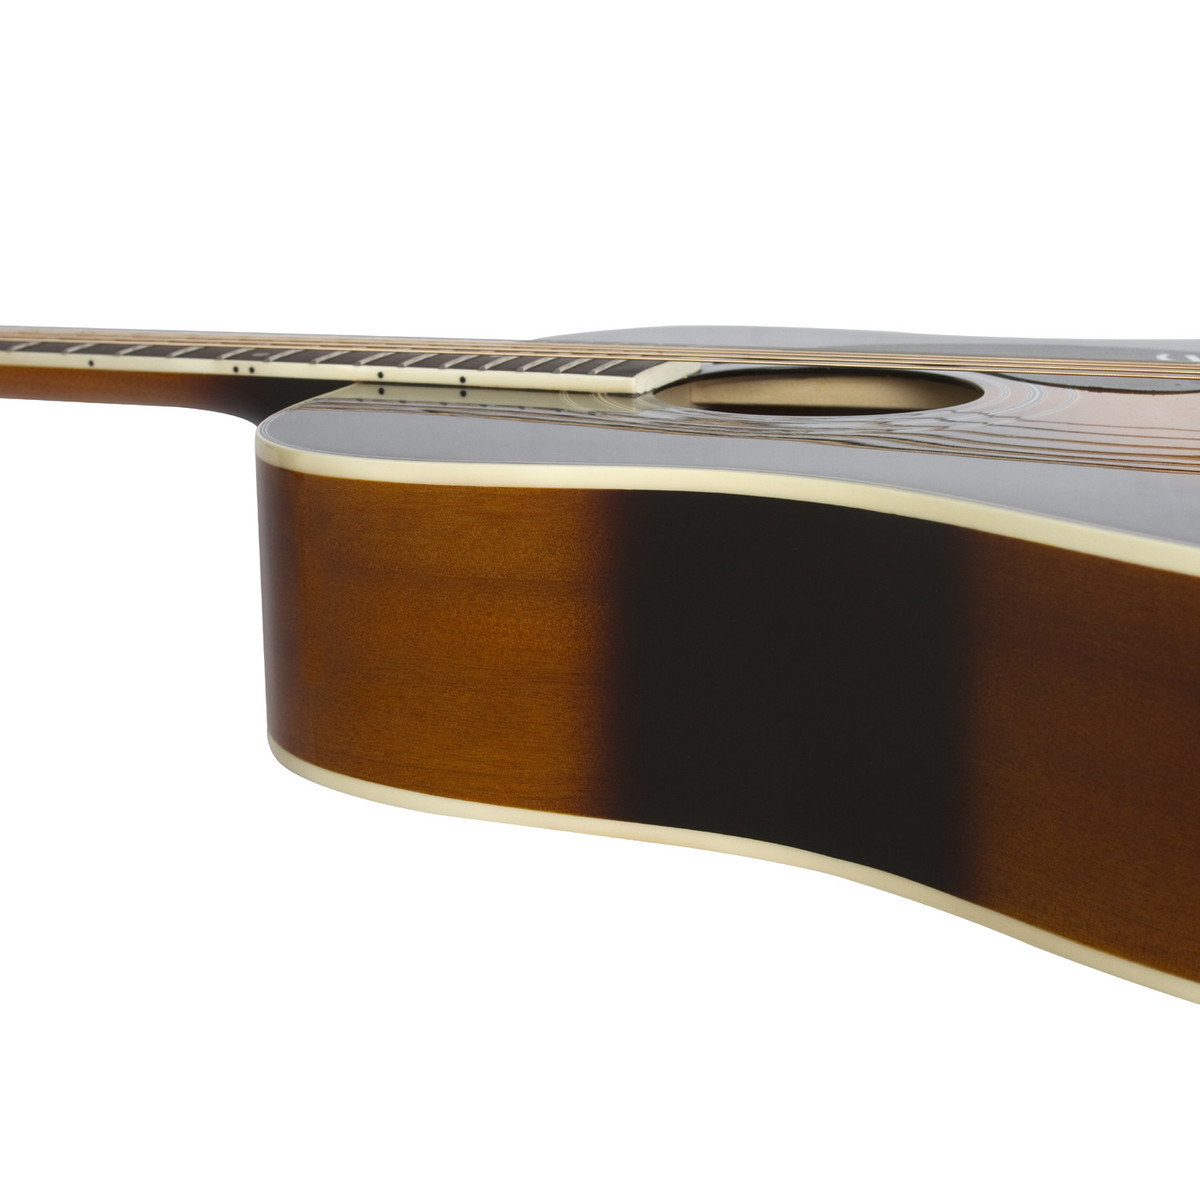 epiphone pro 1 plus acoustic guitar for beginners sunburst at. Black Bedroom Furniture Sets. Home Design Ideas